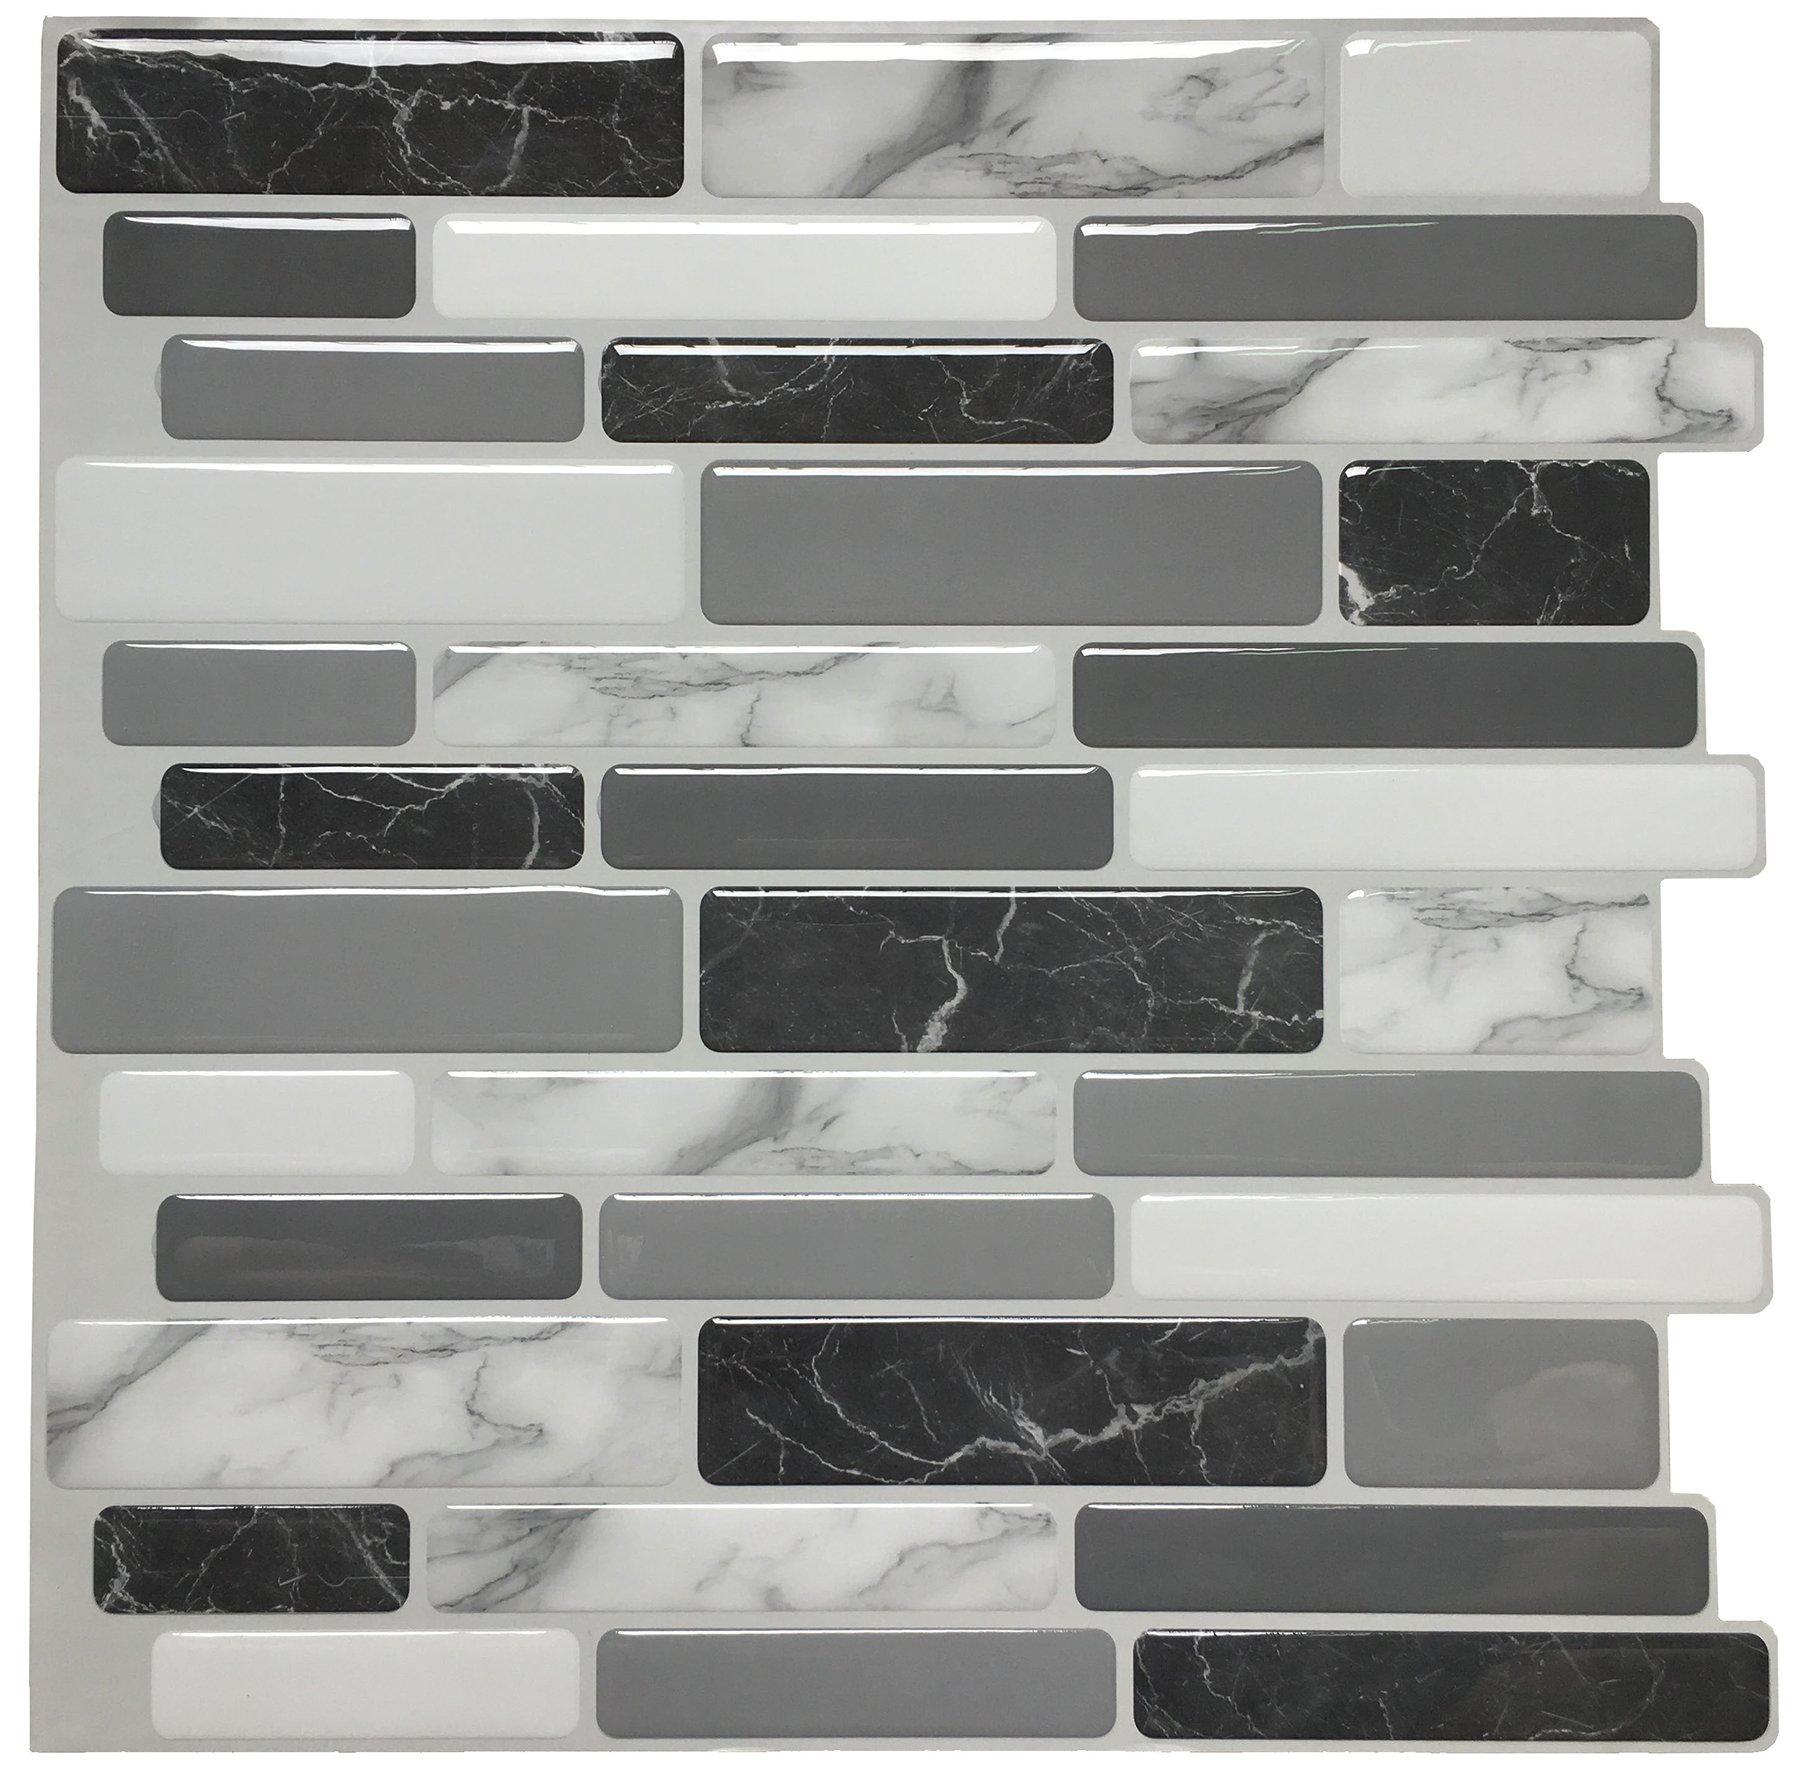 Art3d 12''x12'' Peel and Stick Backsplash Tile for Kitchen, Marble Grey (6 Pack) by Art3d